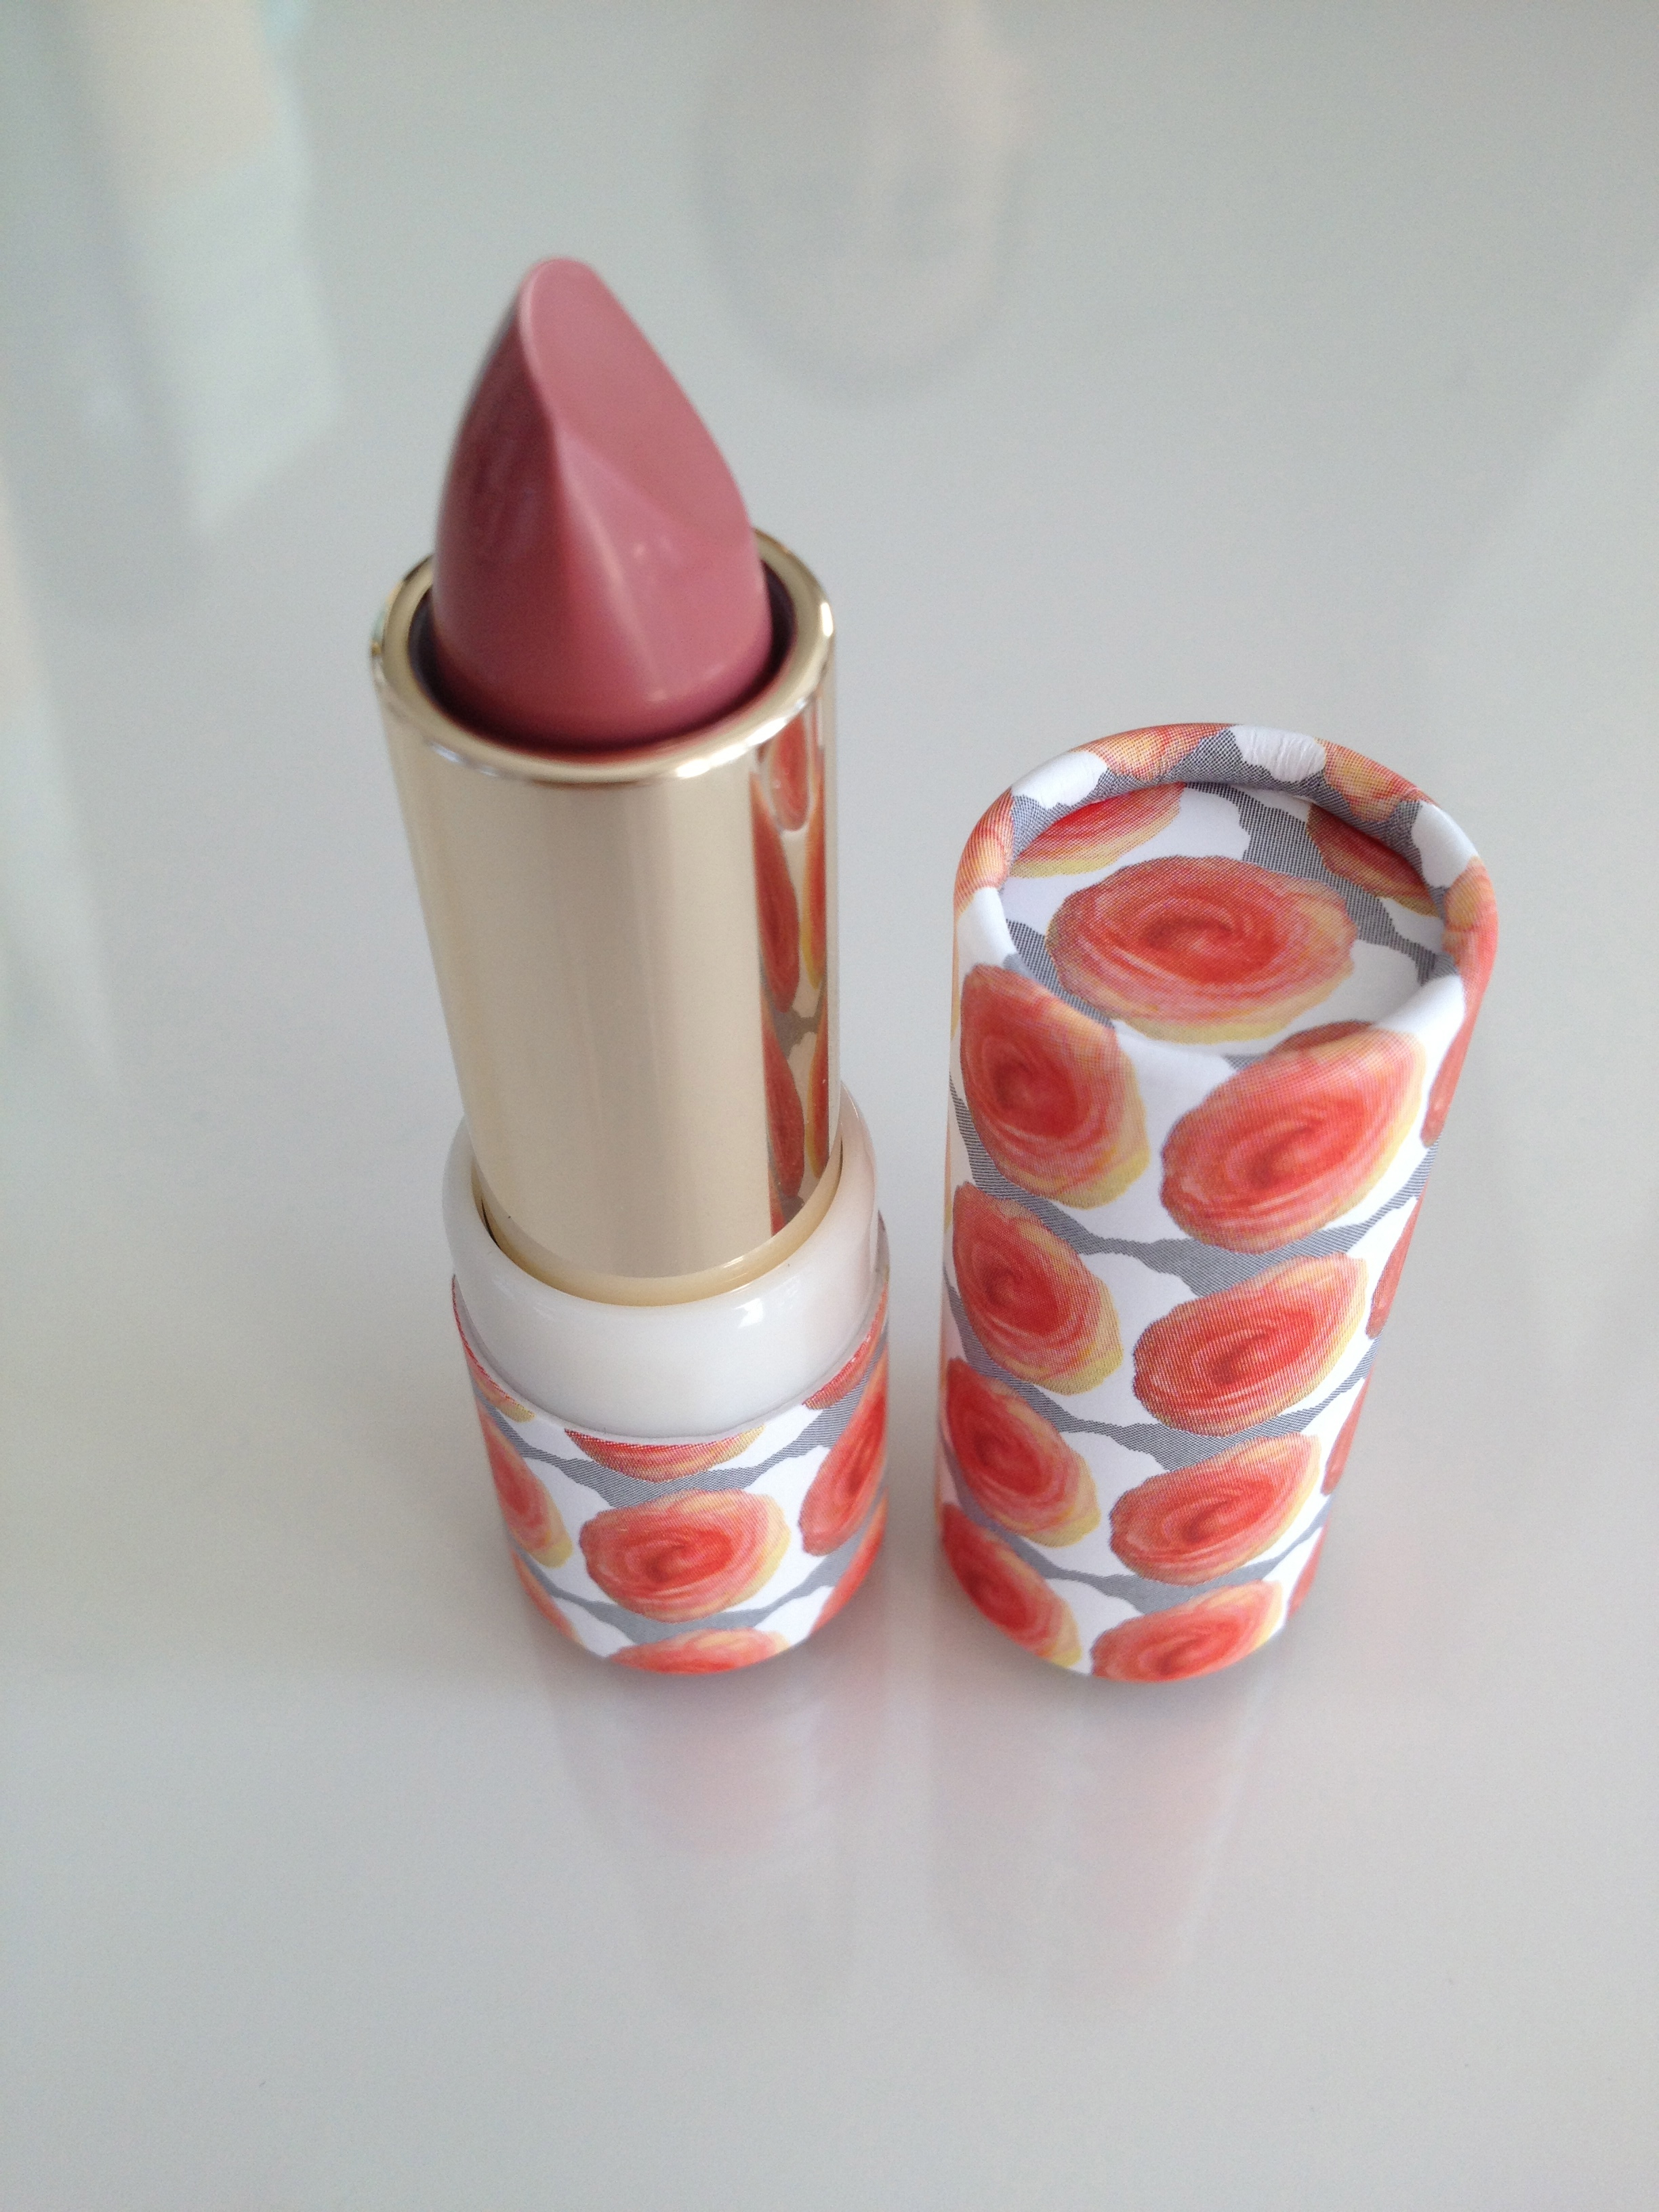 Lipstick - shade 207 in 'Far, far away' packaging